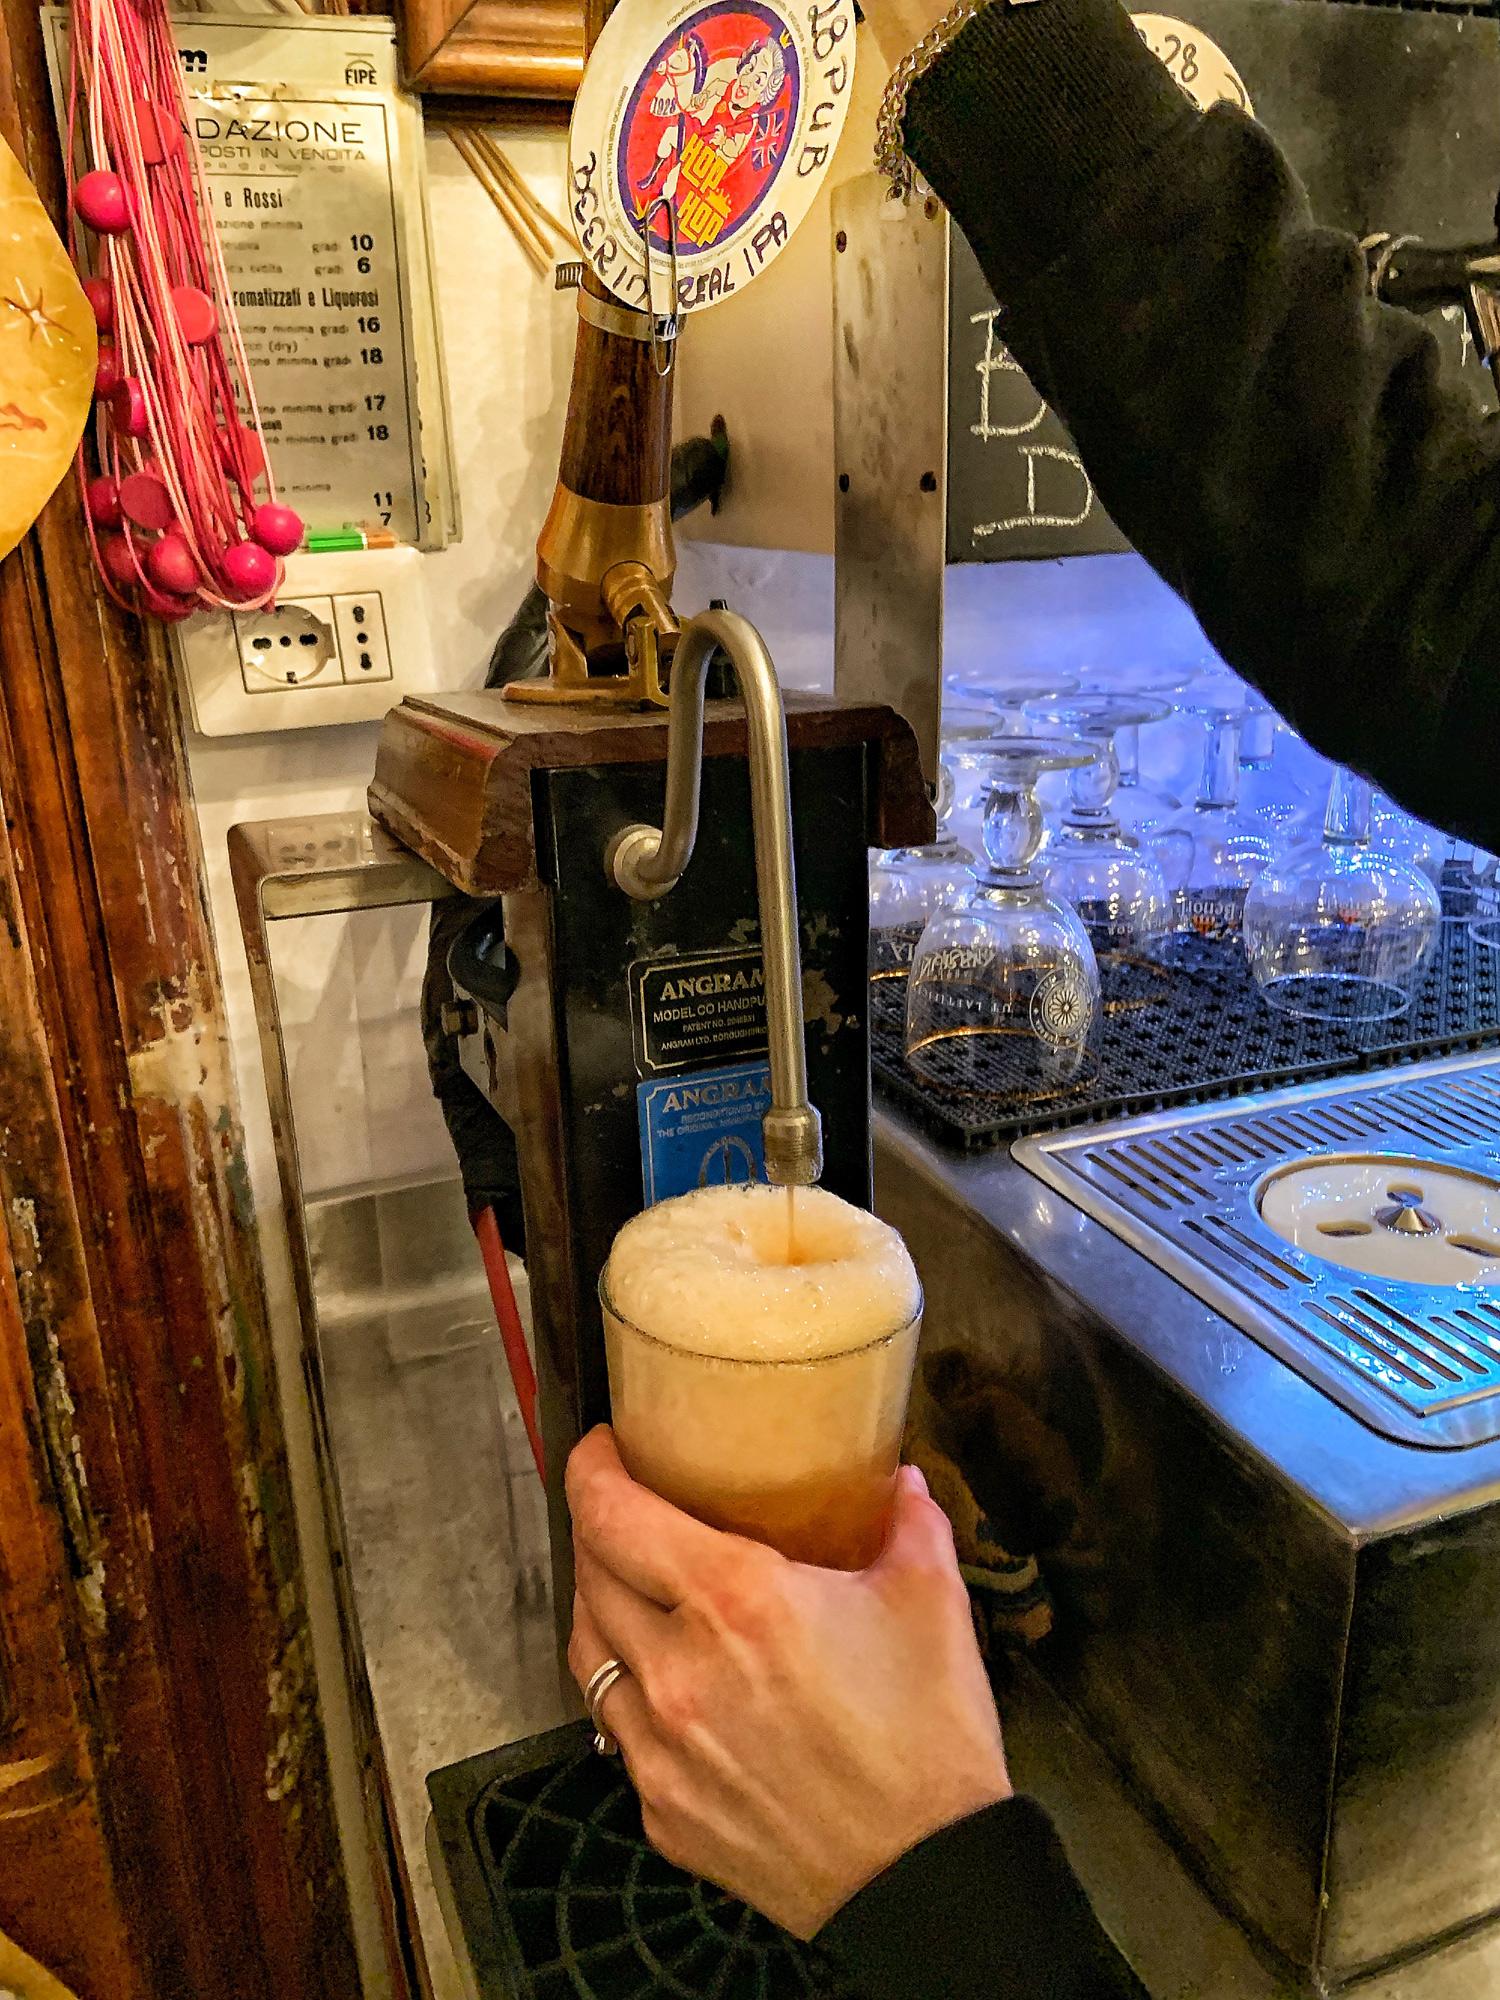 al 19.28 Pub Gourmet la english IPA Hop Hop si spilla a pompa   ©foto Sandra Longinotti